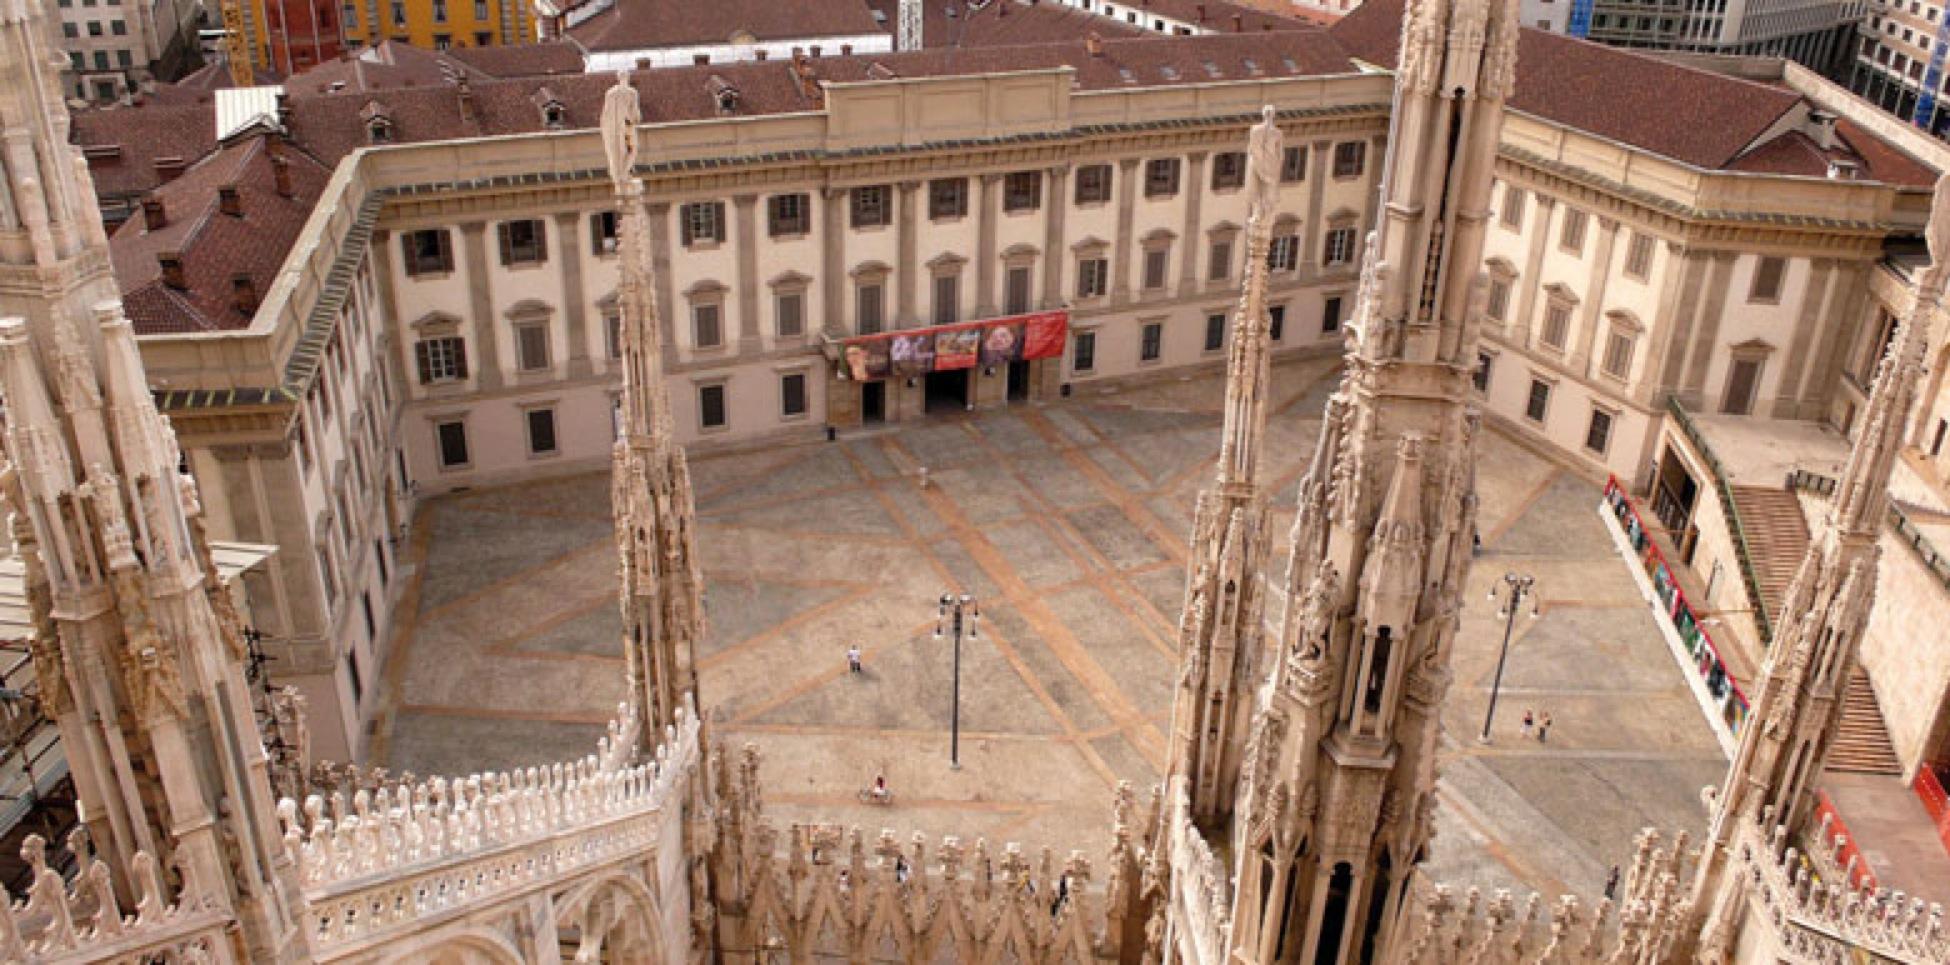 Palazzo-Reale-Milano-